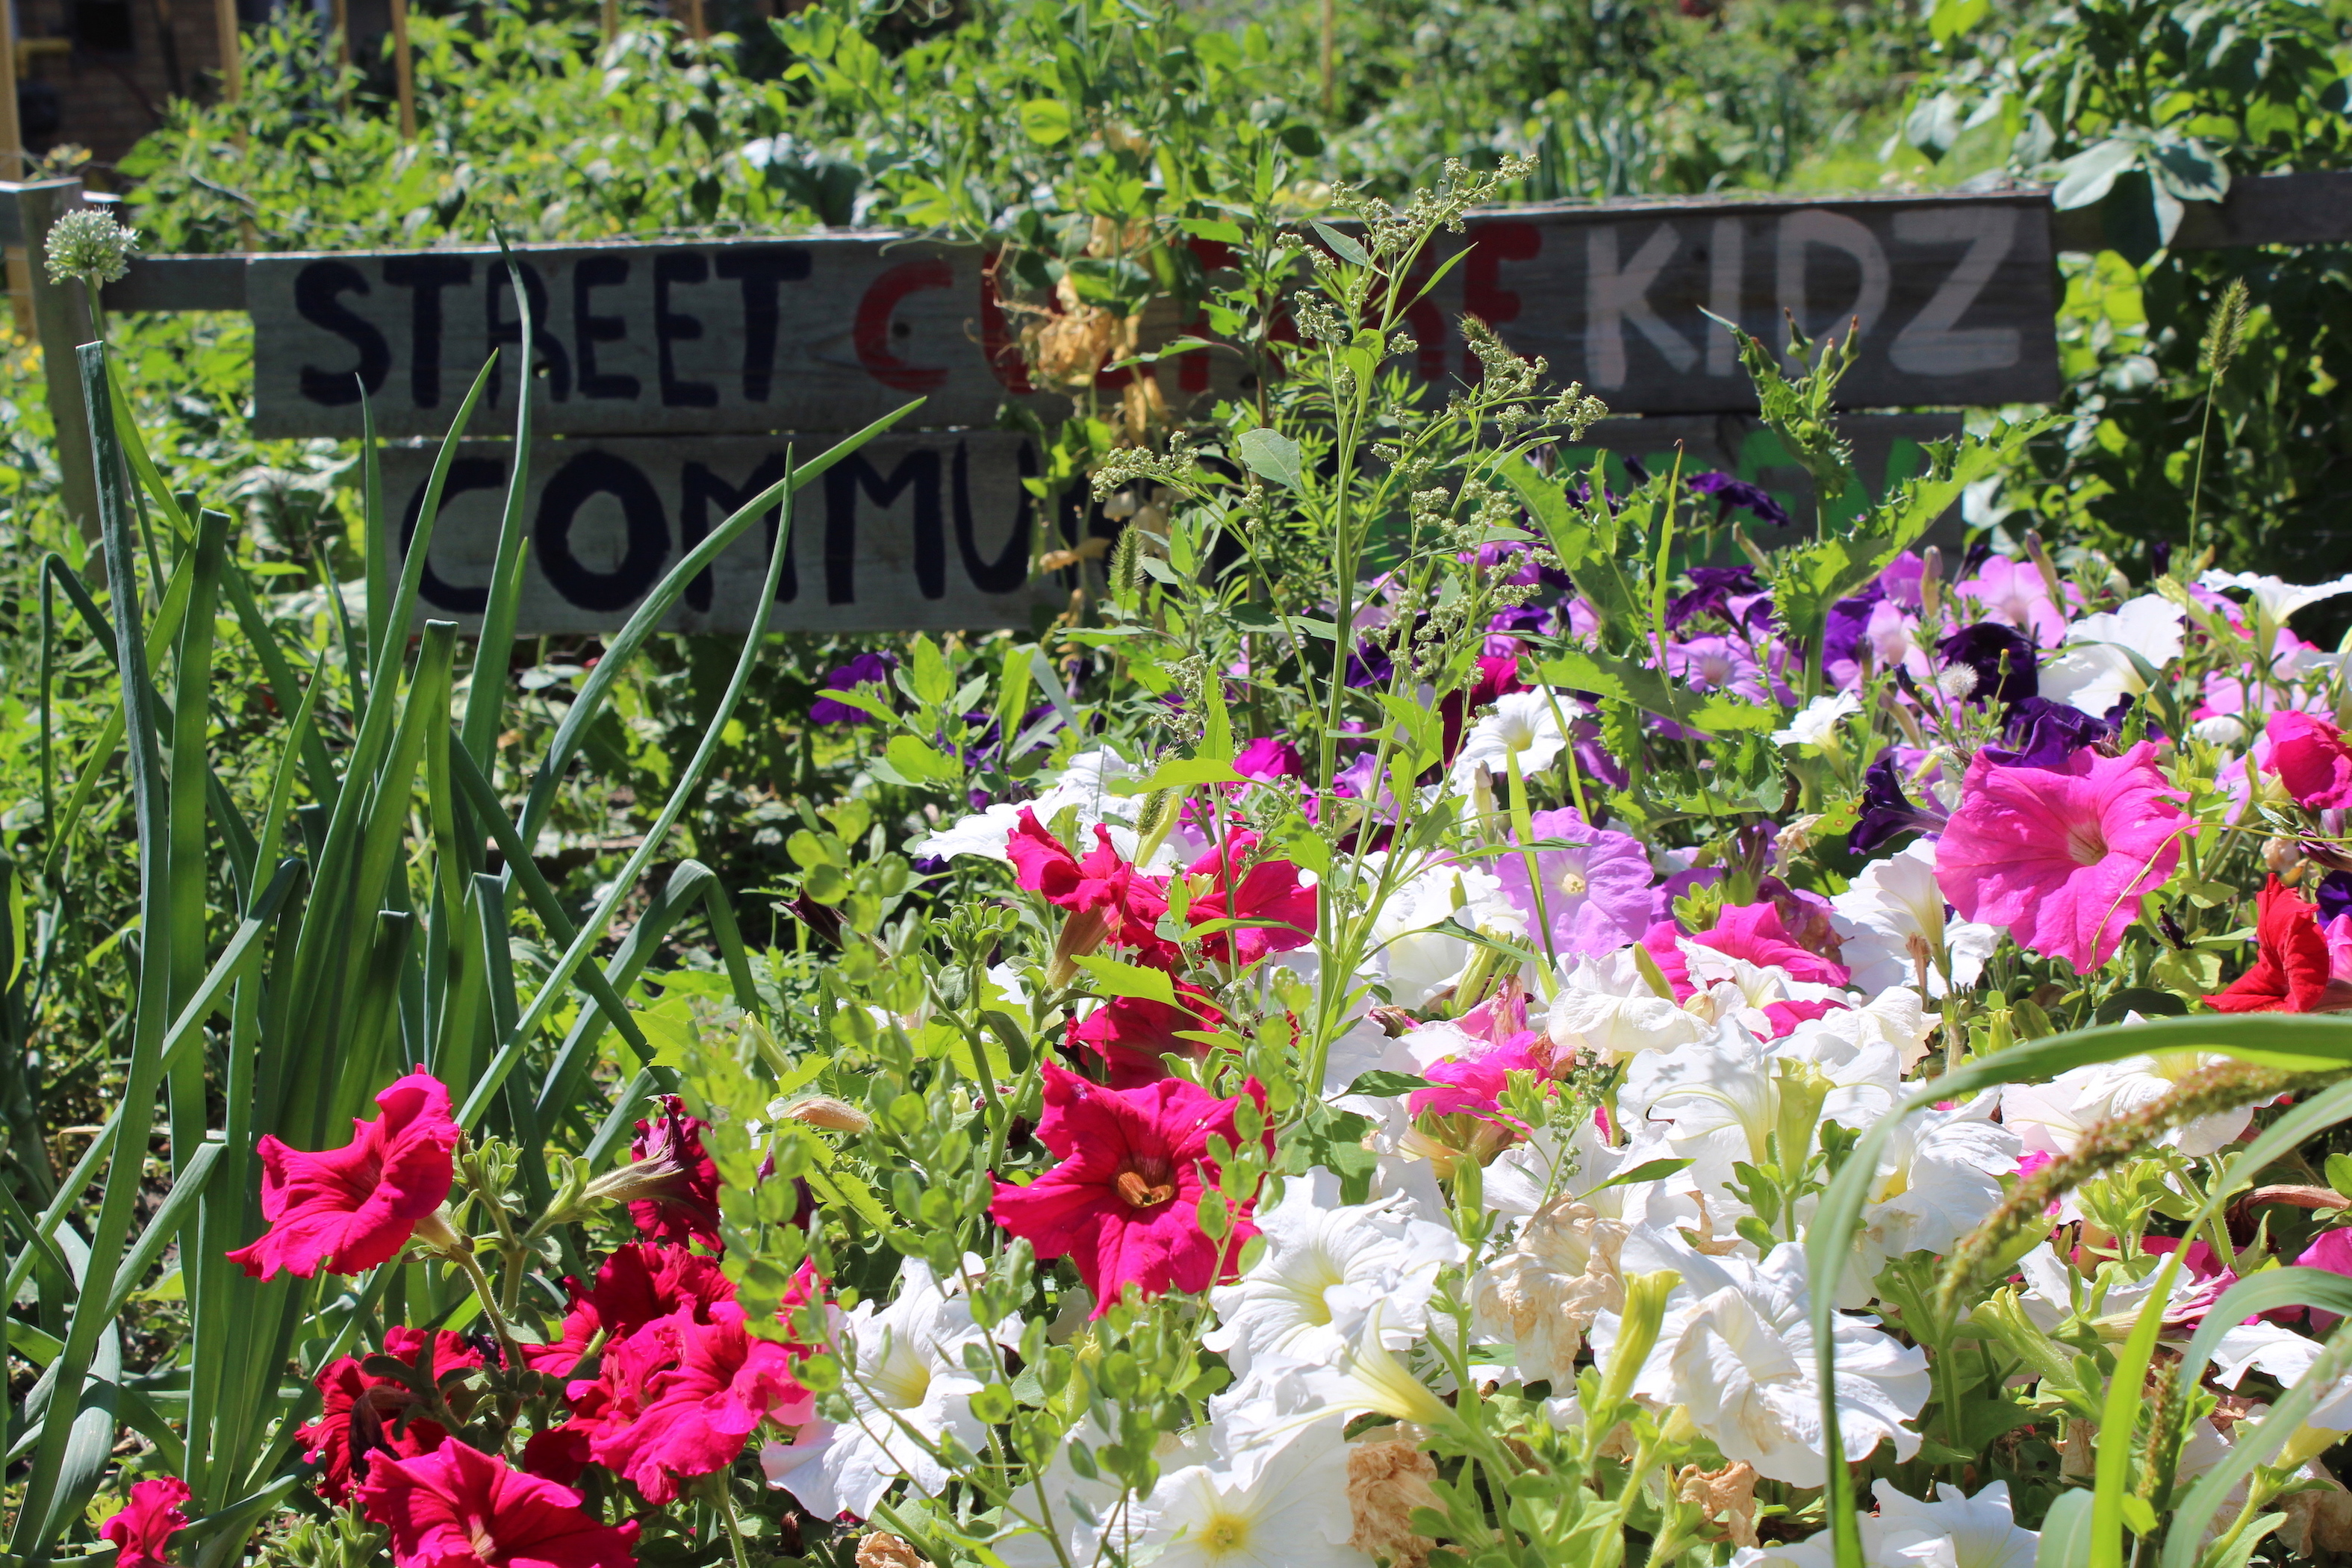 Street Culture Project's garden